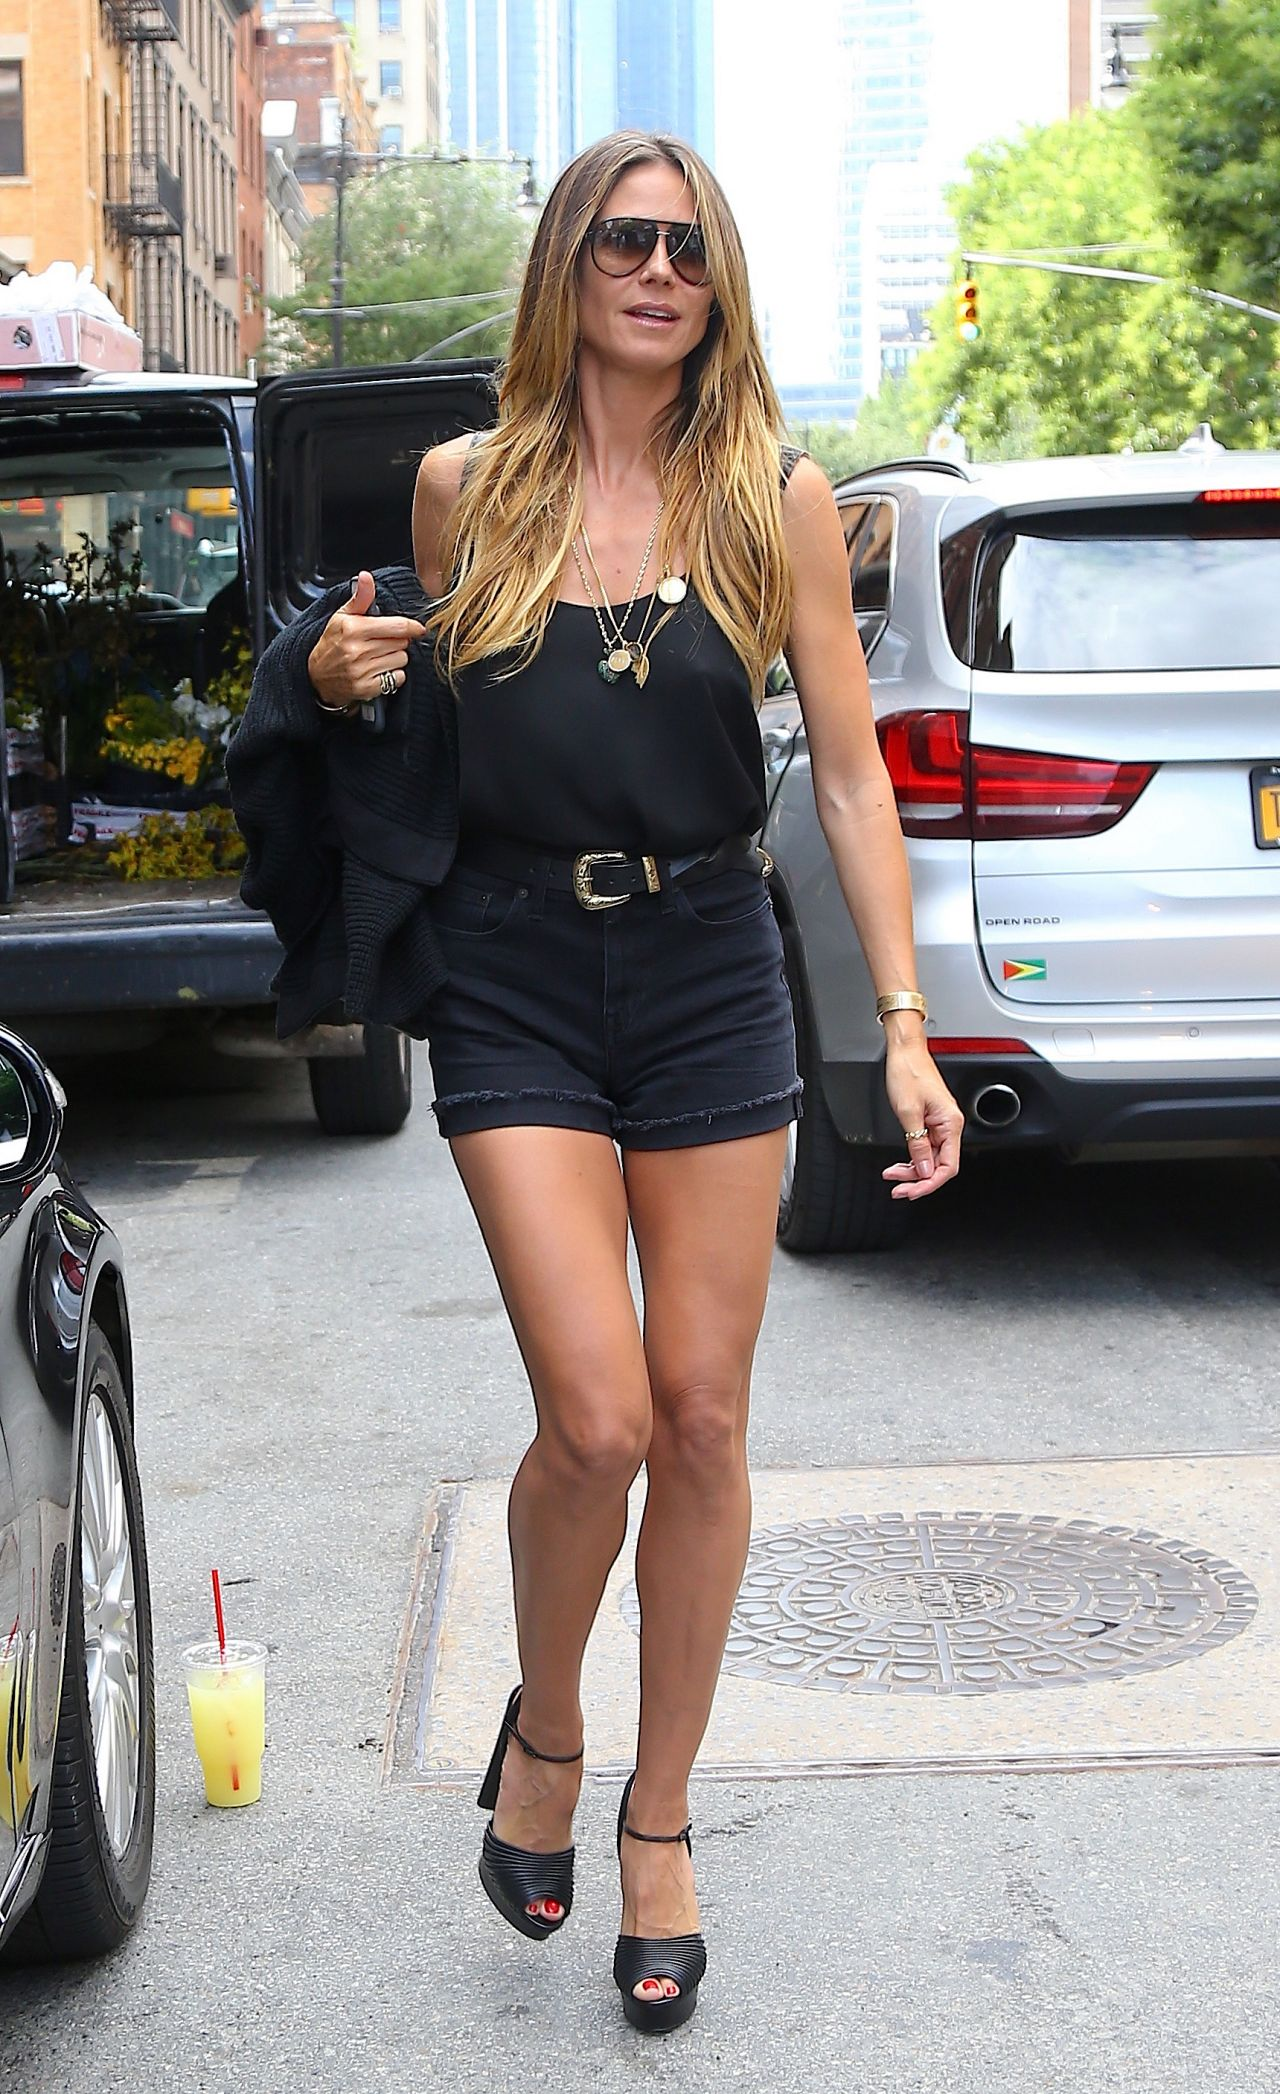 Sexy Bilder: Heidi Klum rekelt sich im knappen Bikini